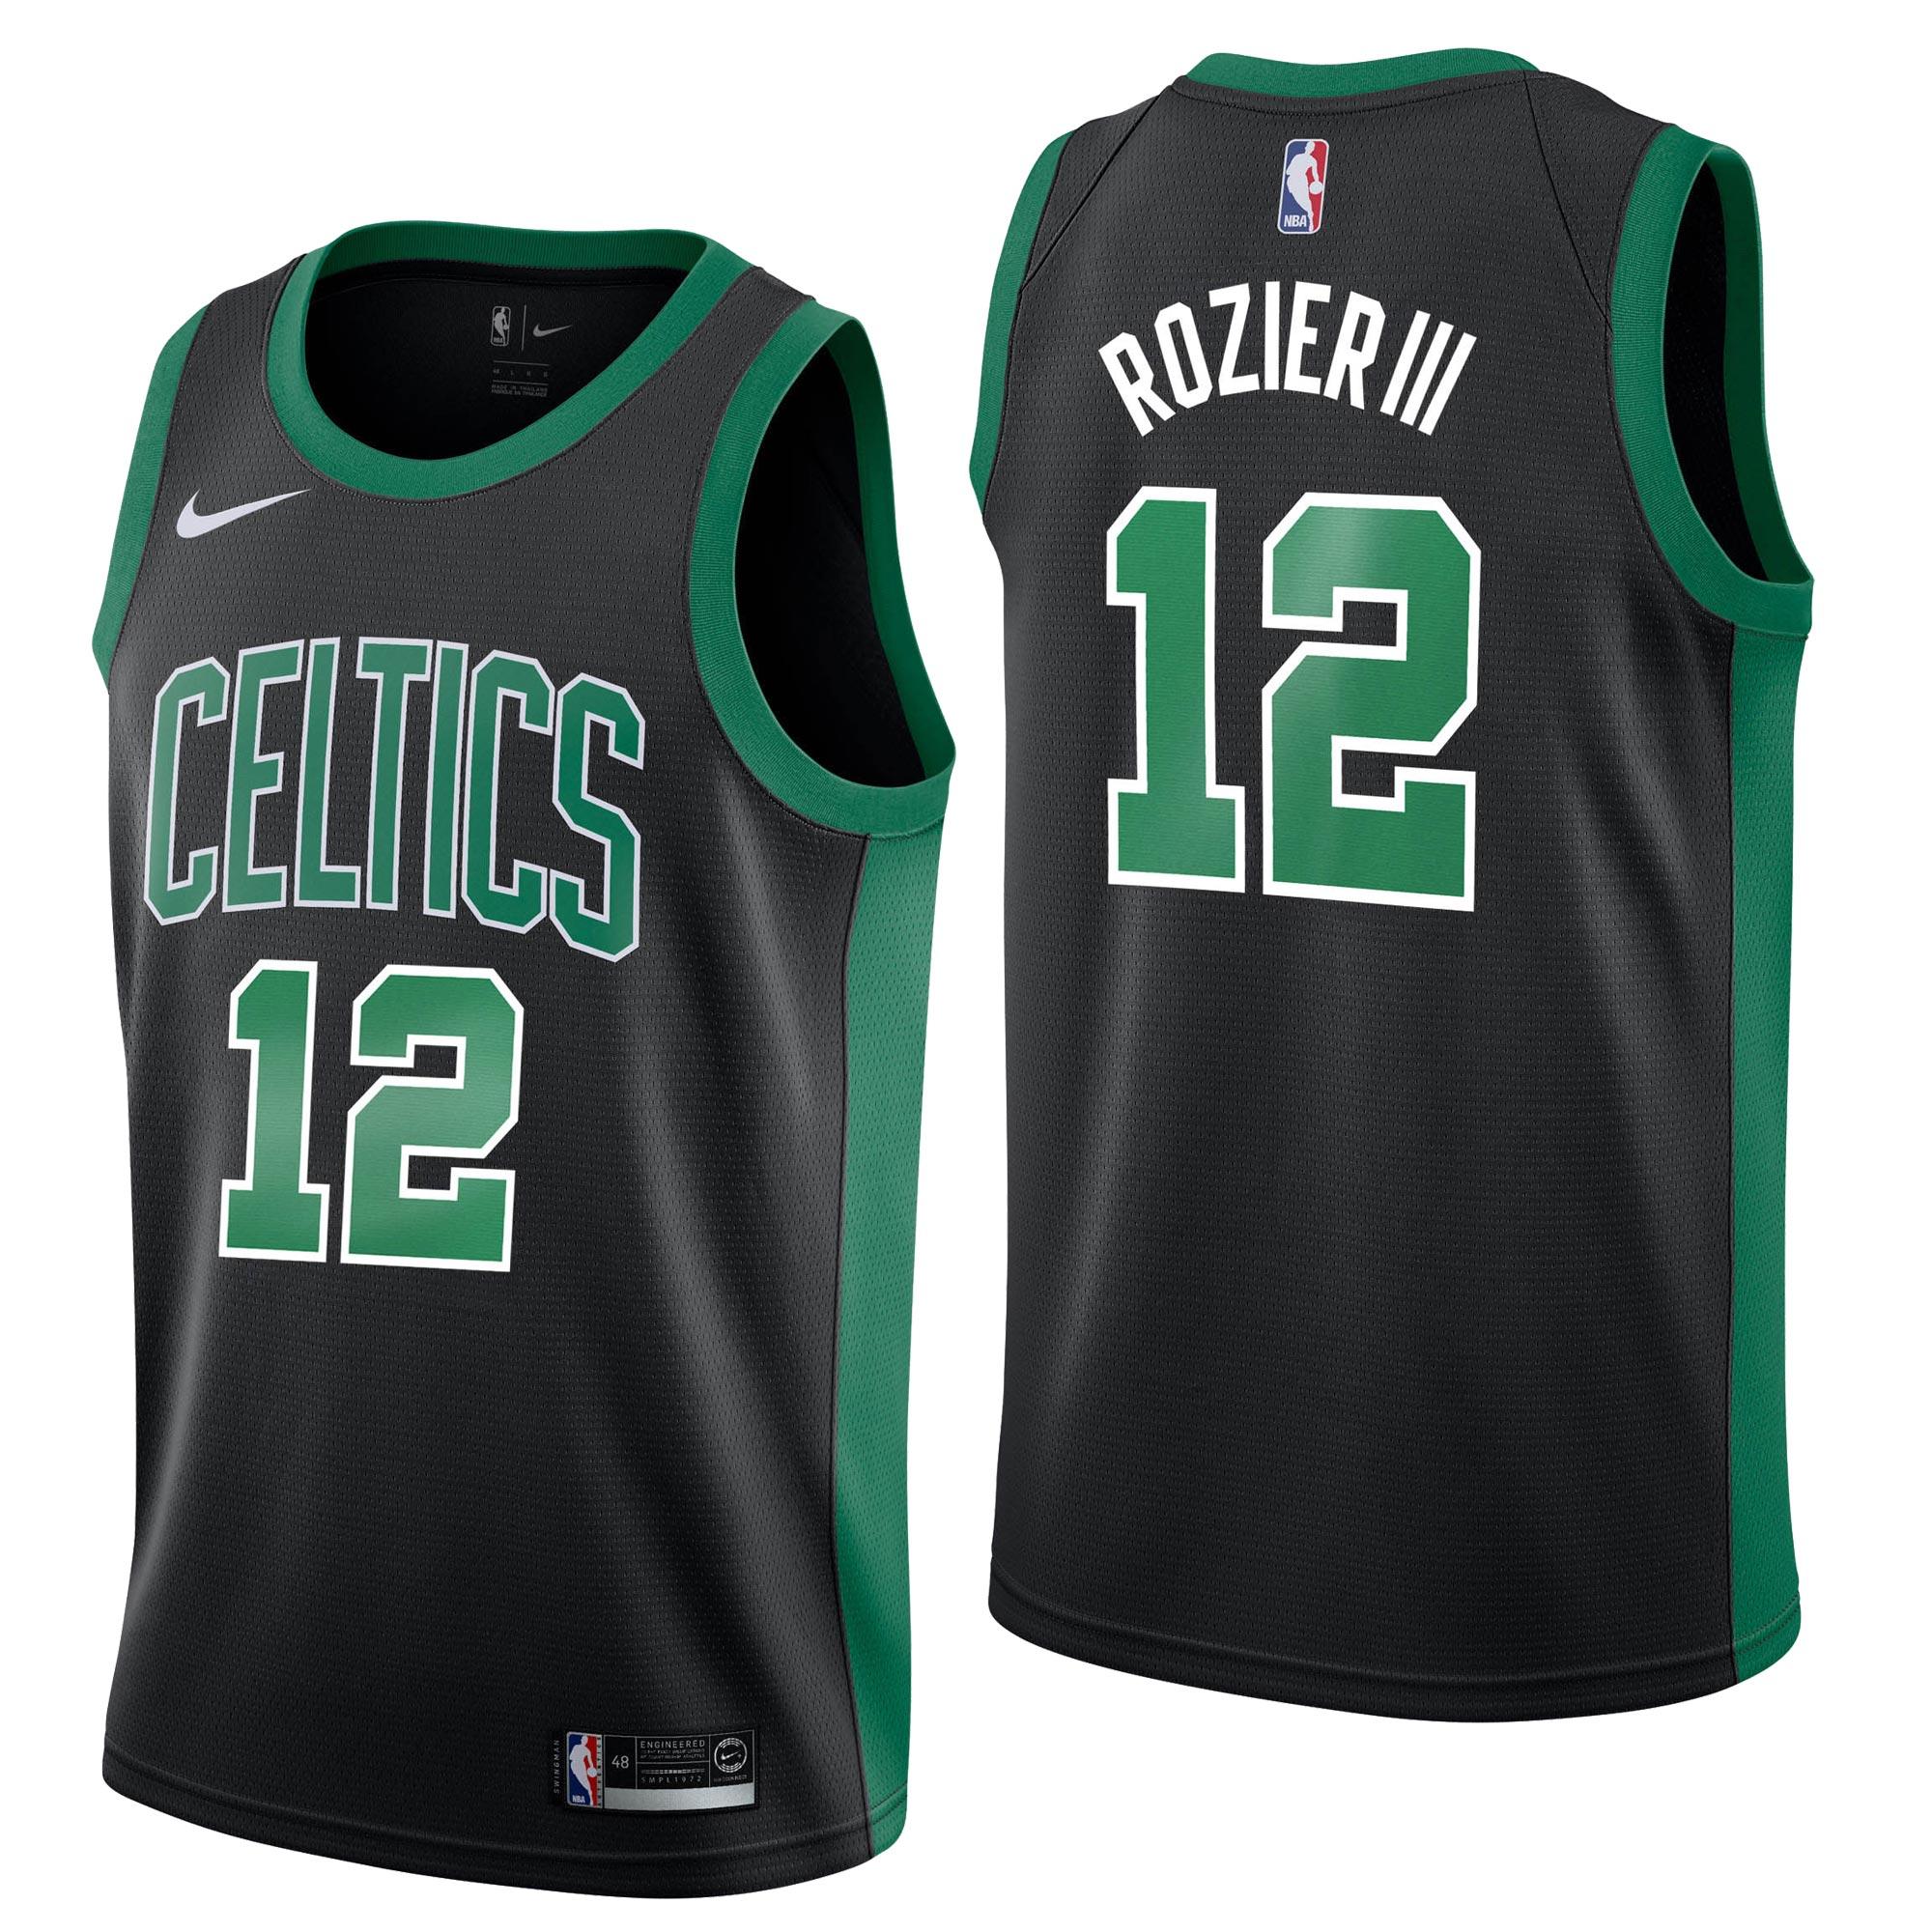 """Boston Celtics Nike Statement Swingman Jersey - Terry Rozier - Mens"""